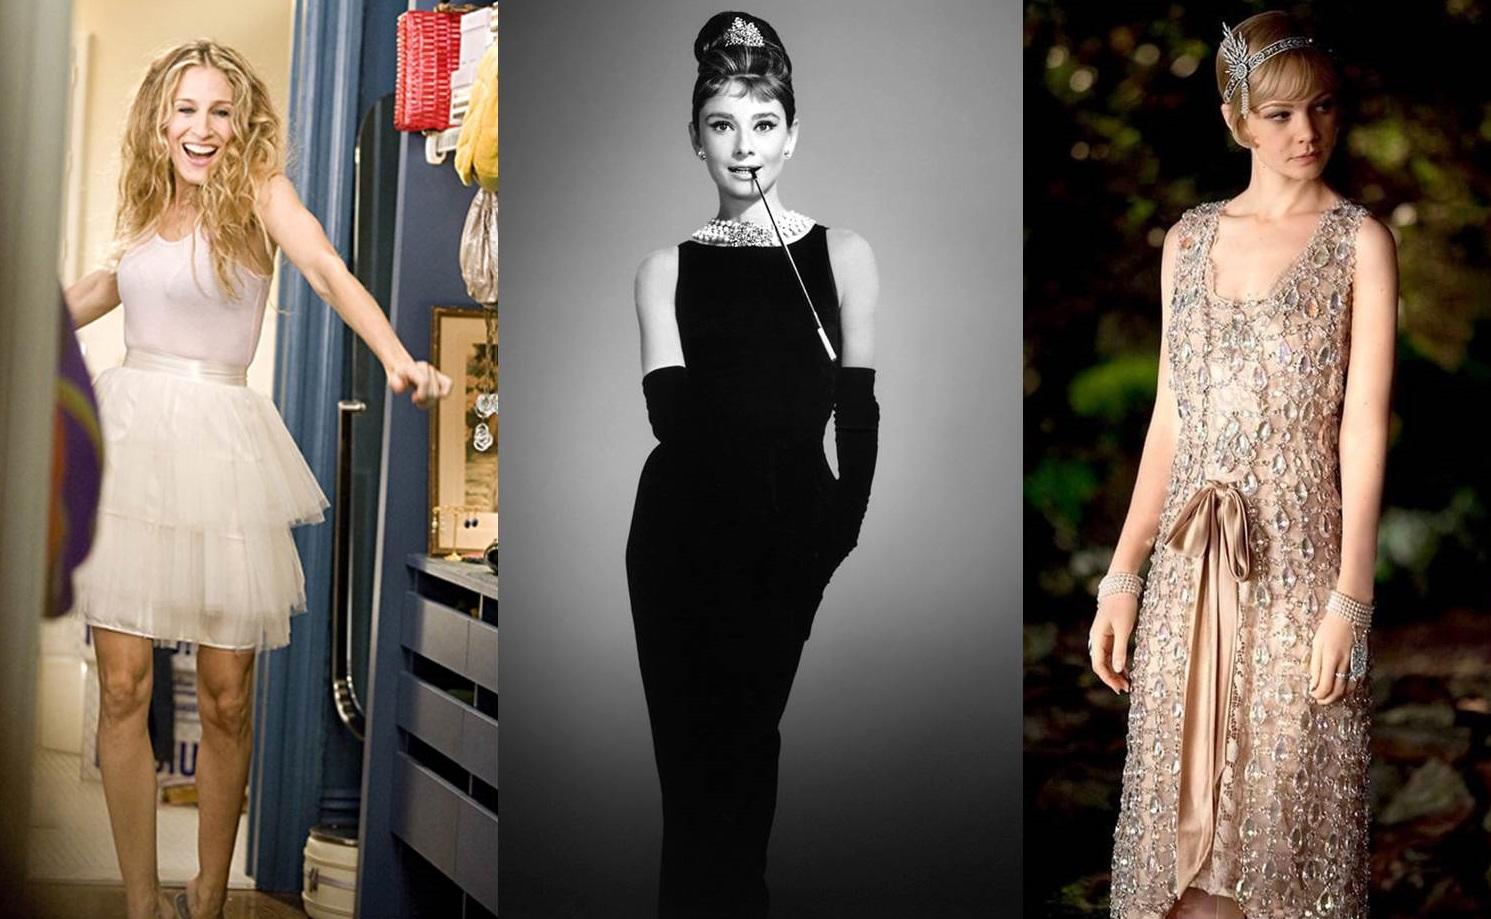 Costumi di Carnevale: 10 idee fashion ispirate ai film